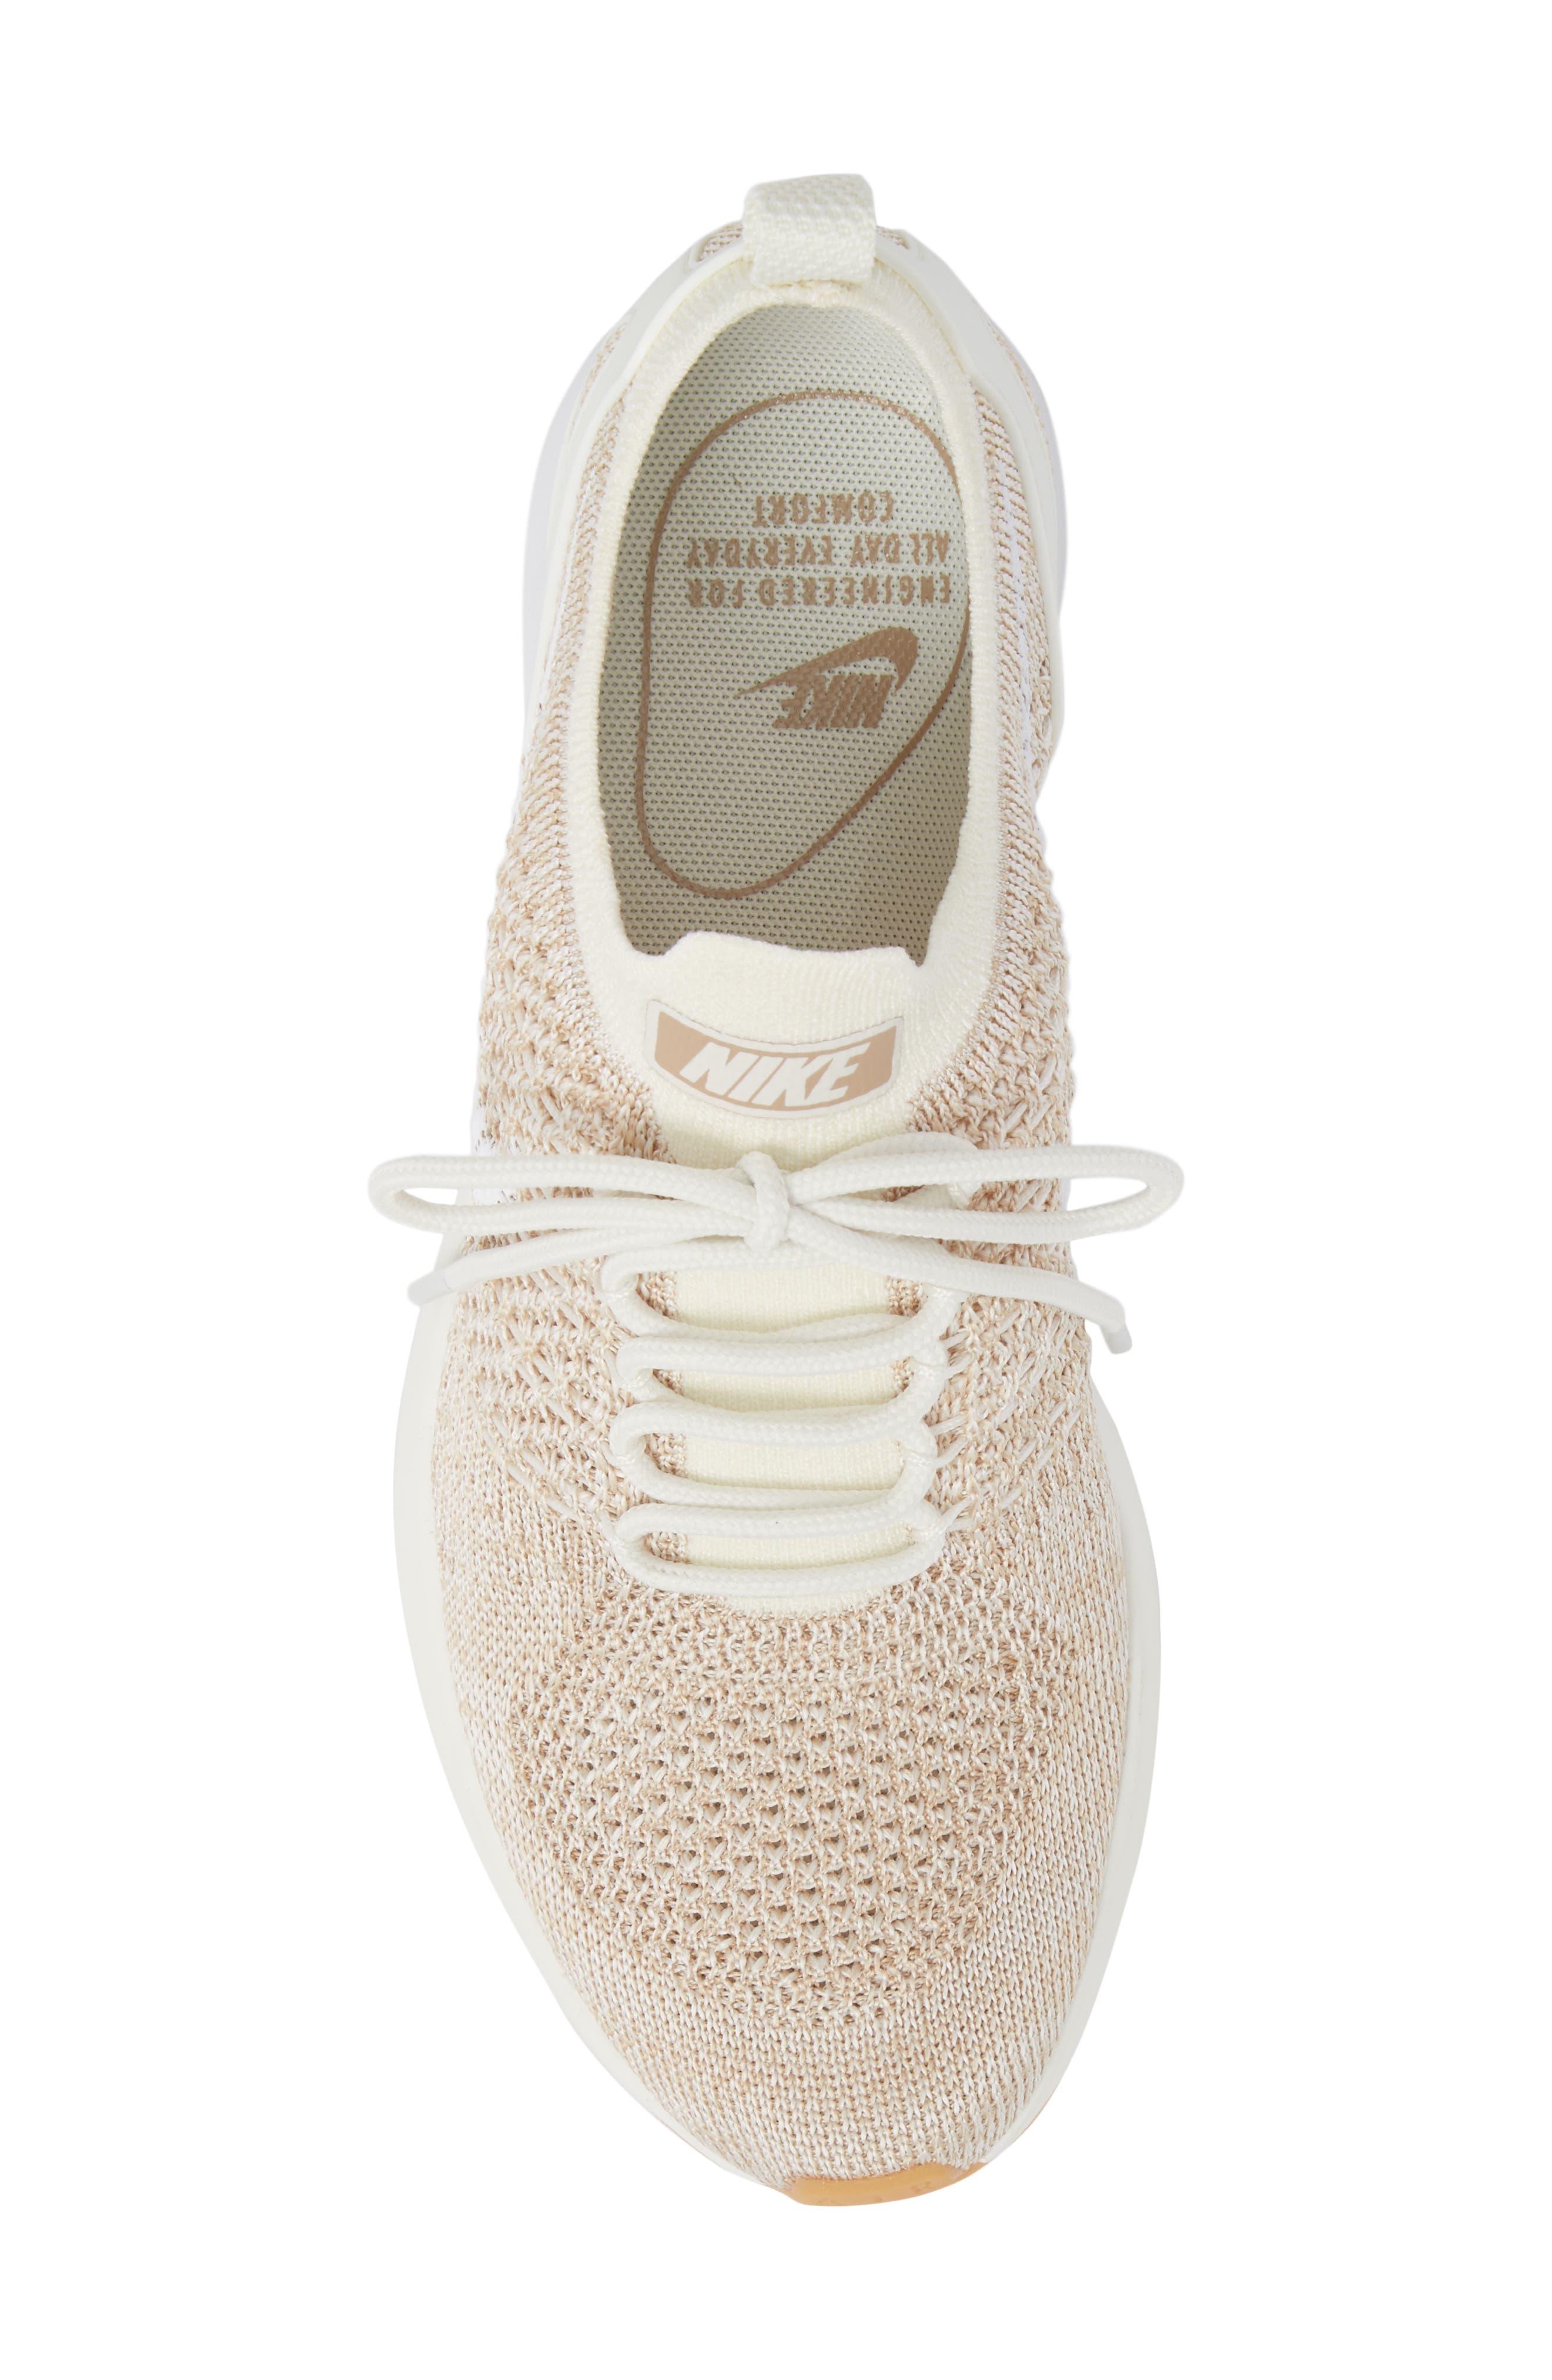 Air Zoom Mariah Flyknit Racer Sneaker,                             Alternate thumbnail 5, color,                             Sail/ White/ Sand